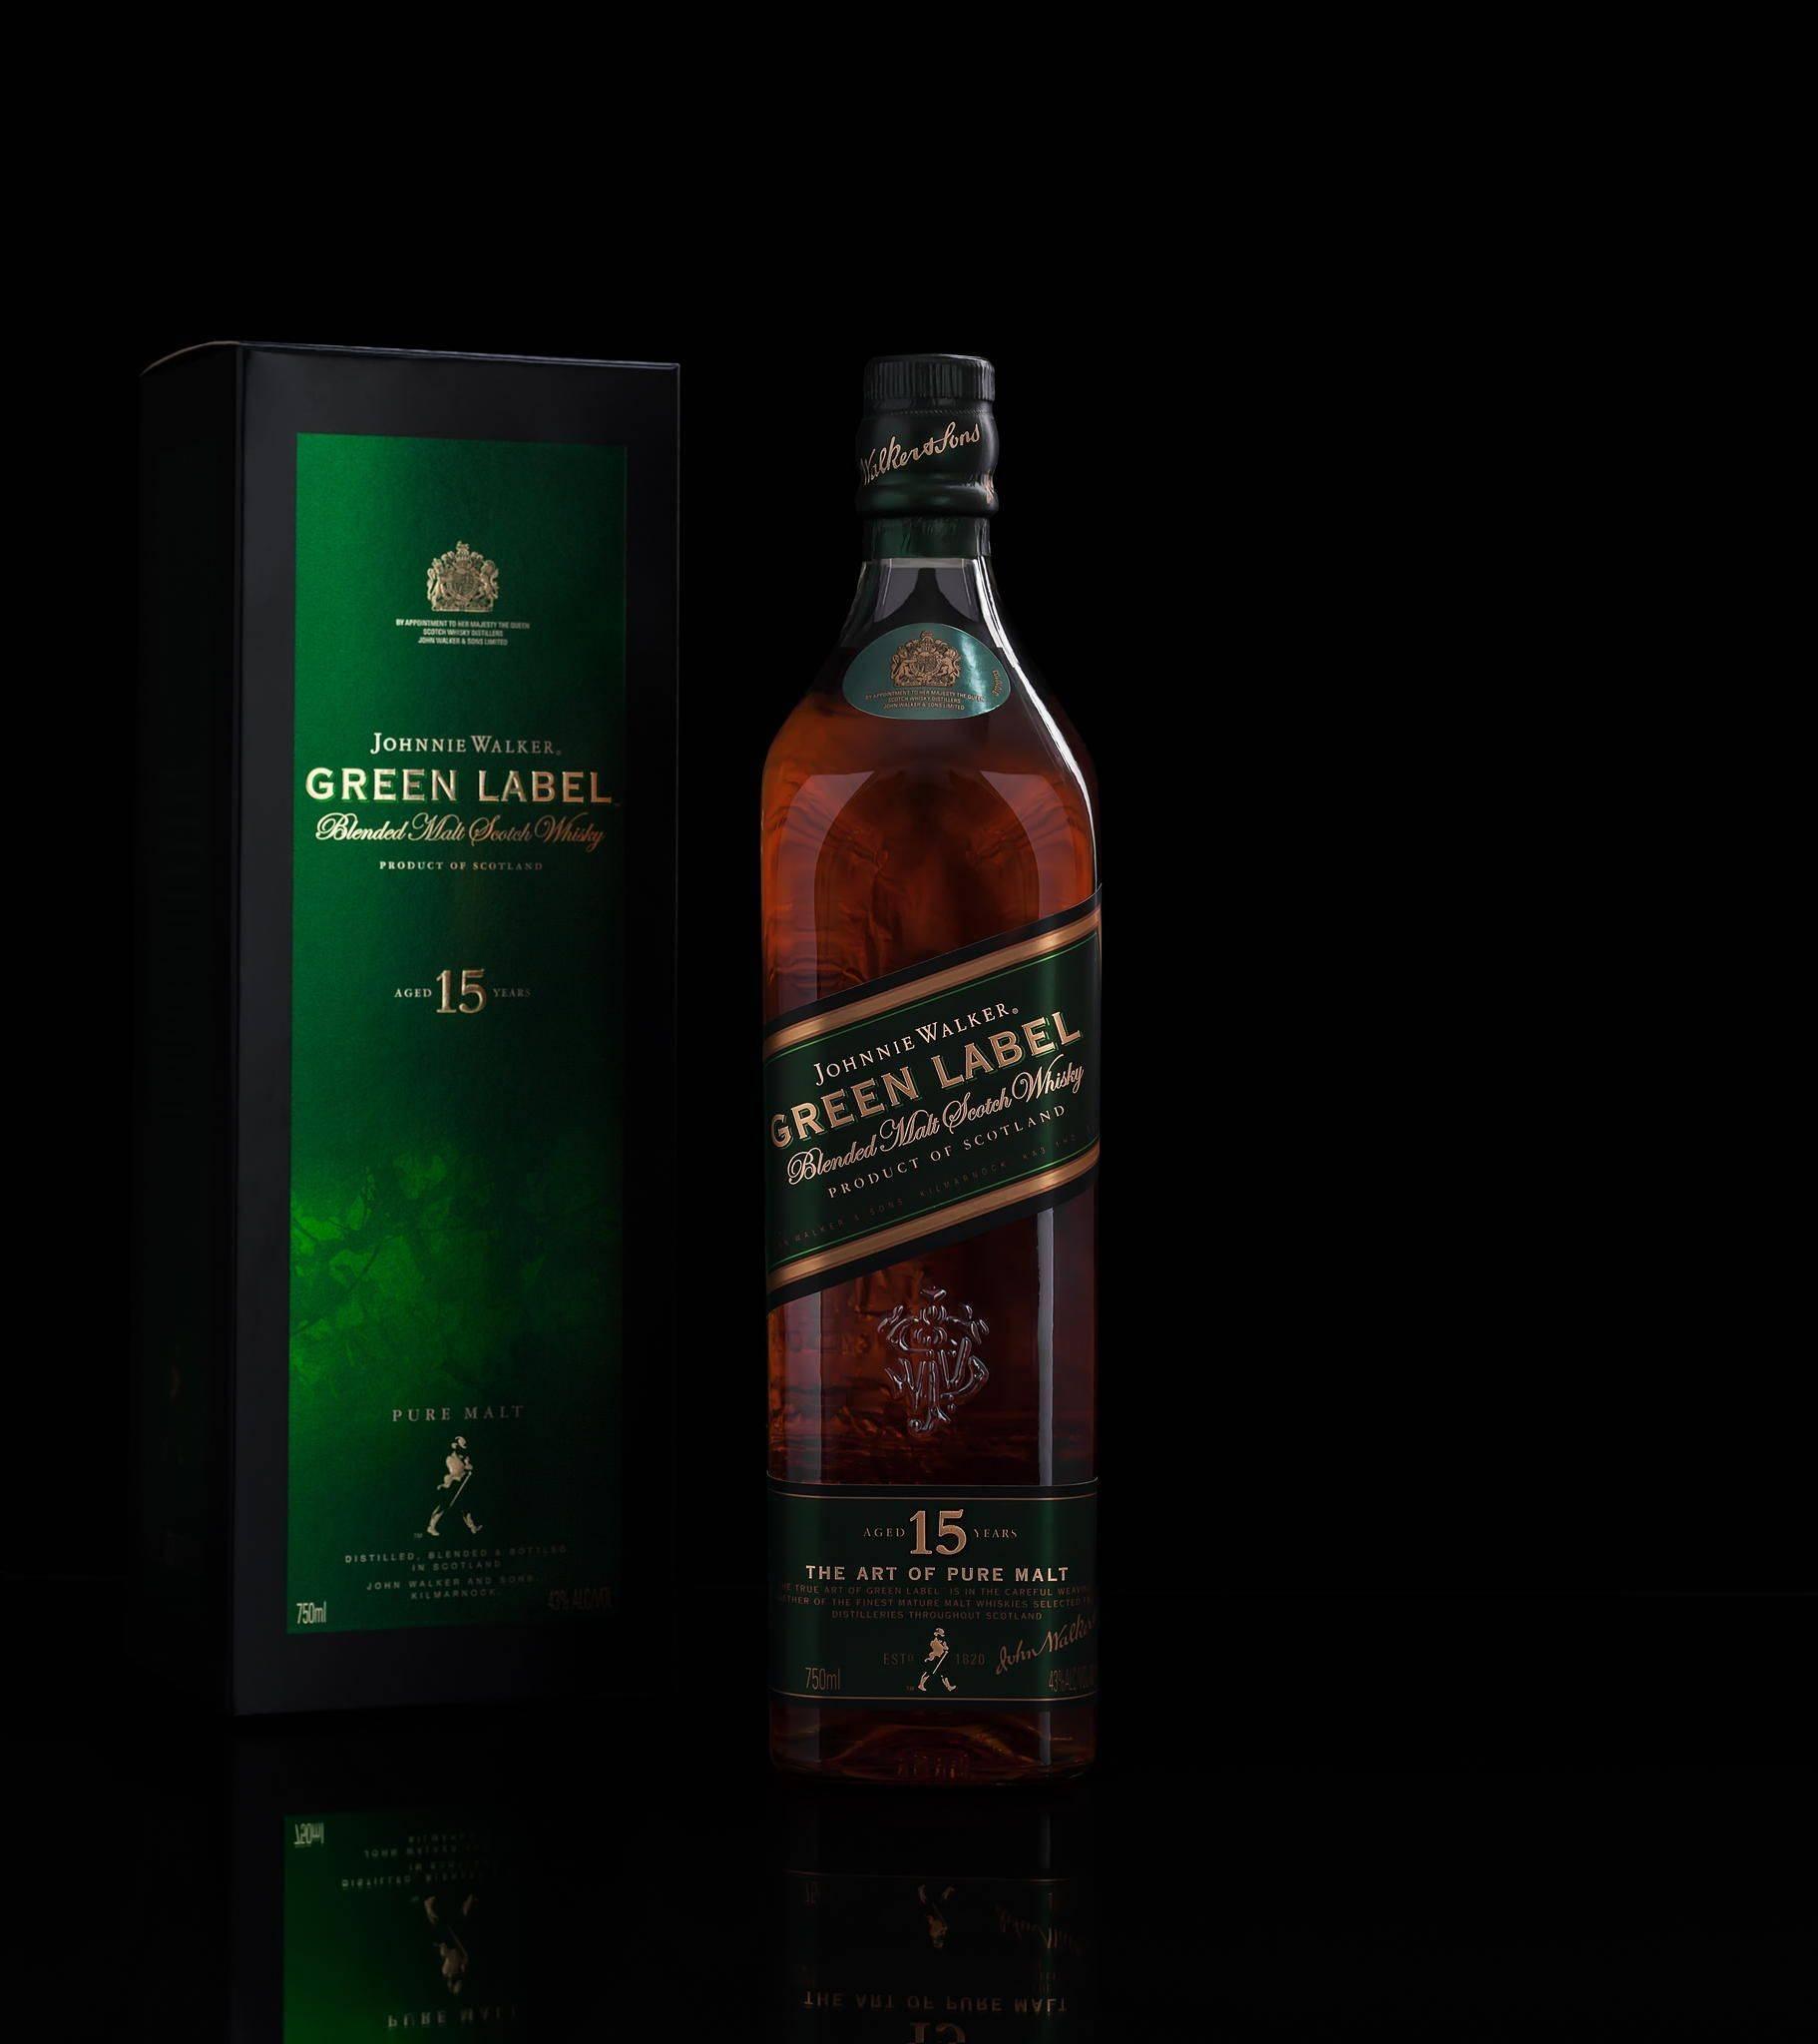 Виски Johnnie Walker Green Label (Джонни Уокер Грин Лейбл) и его особенности